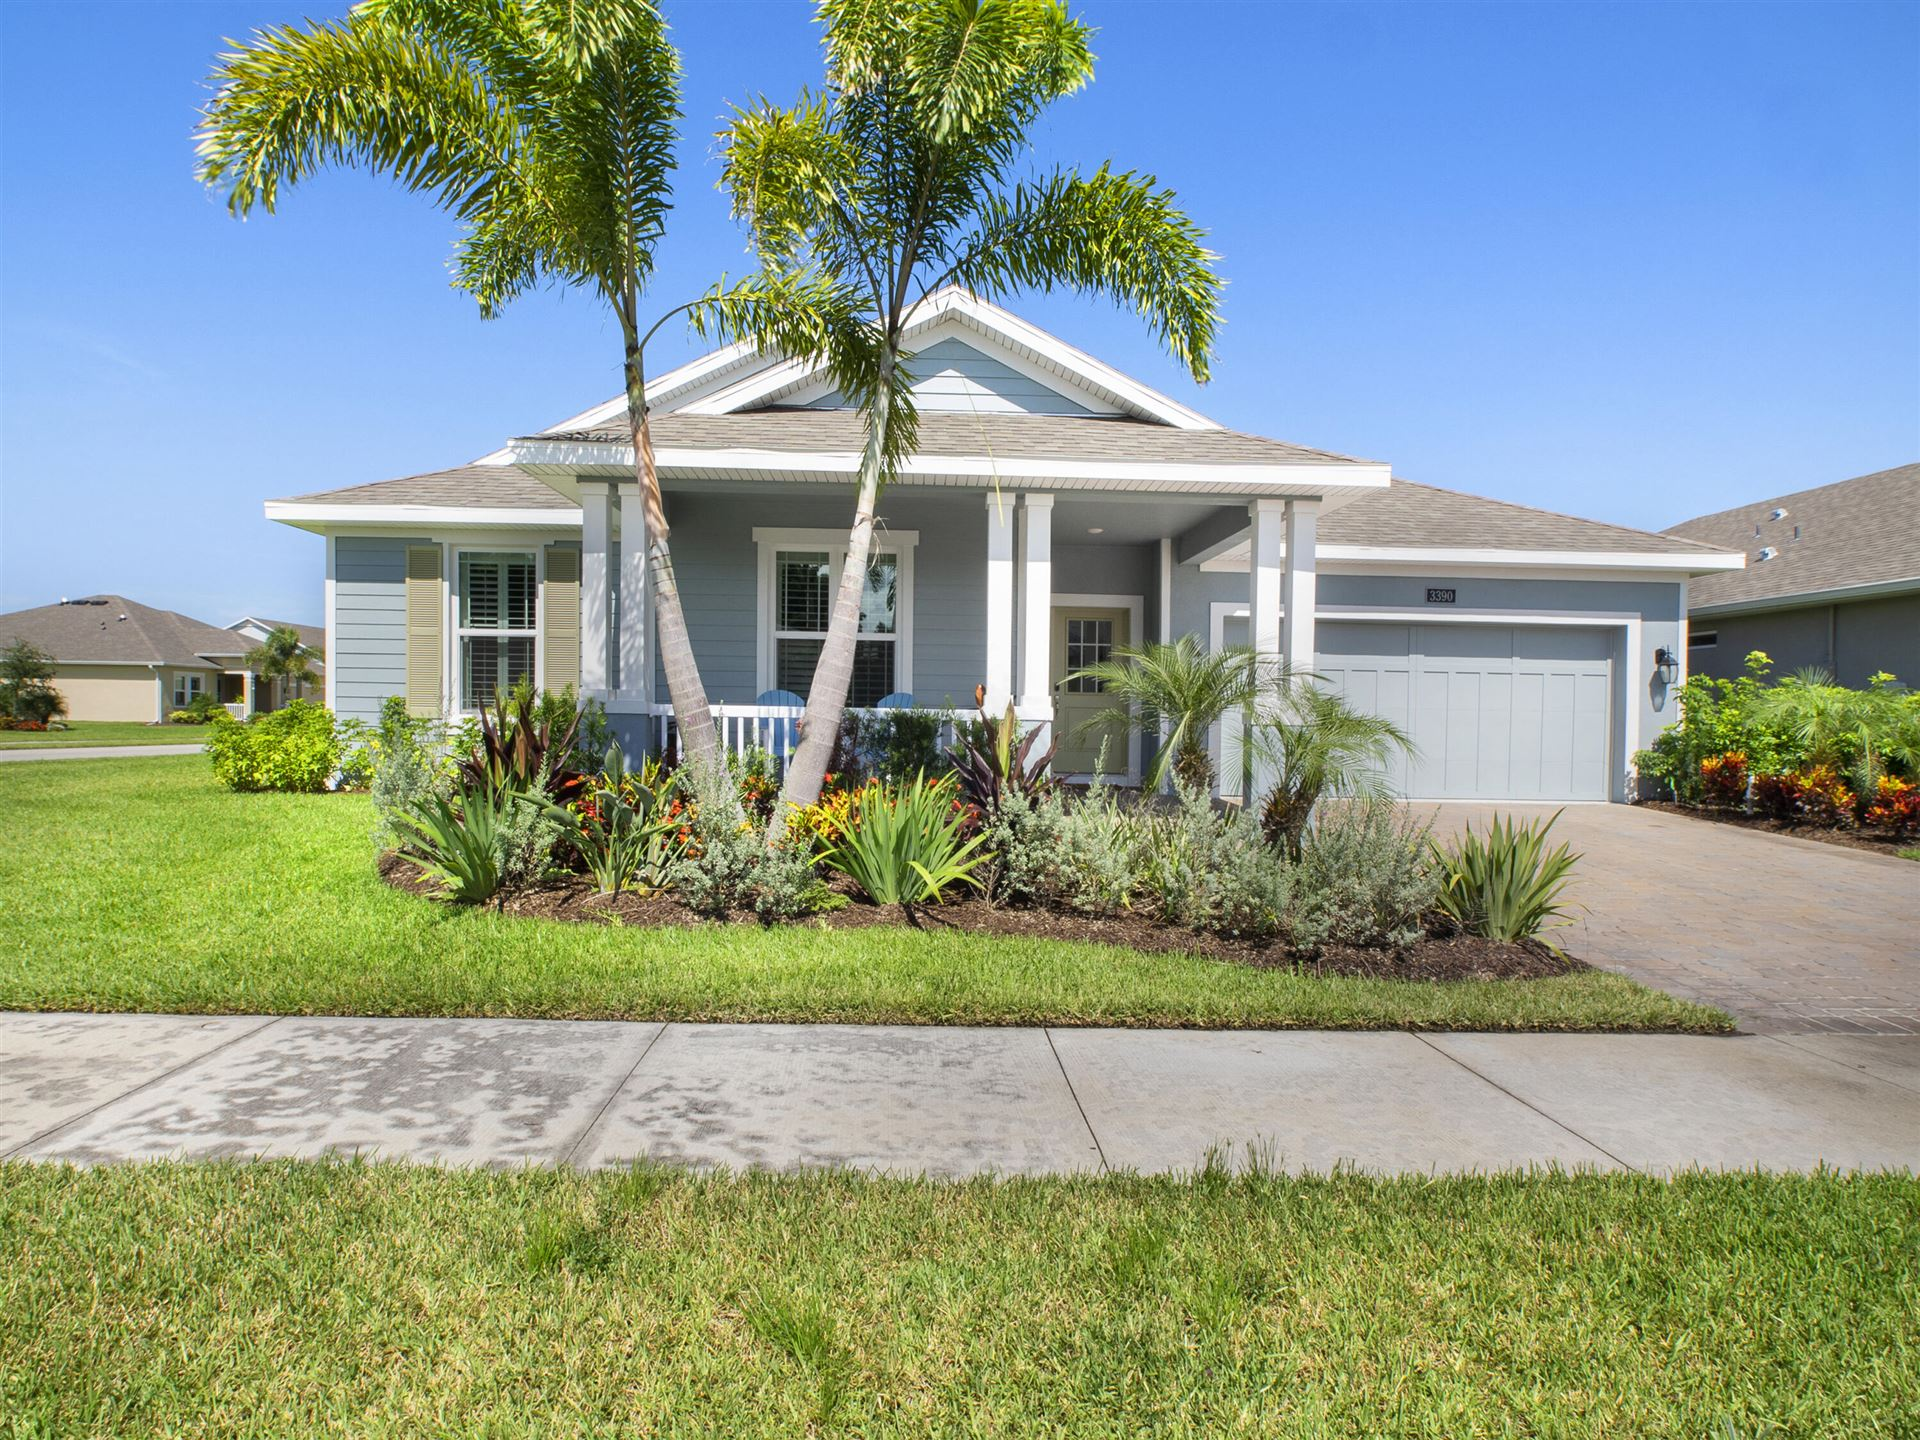 3390 Wild Banyan Way, Vero Beach, FL 32966 - #: RX-10736911